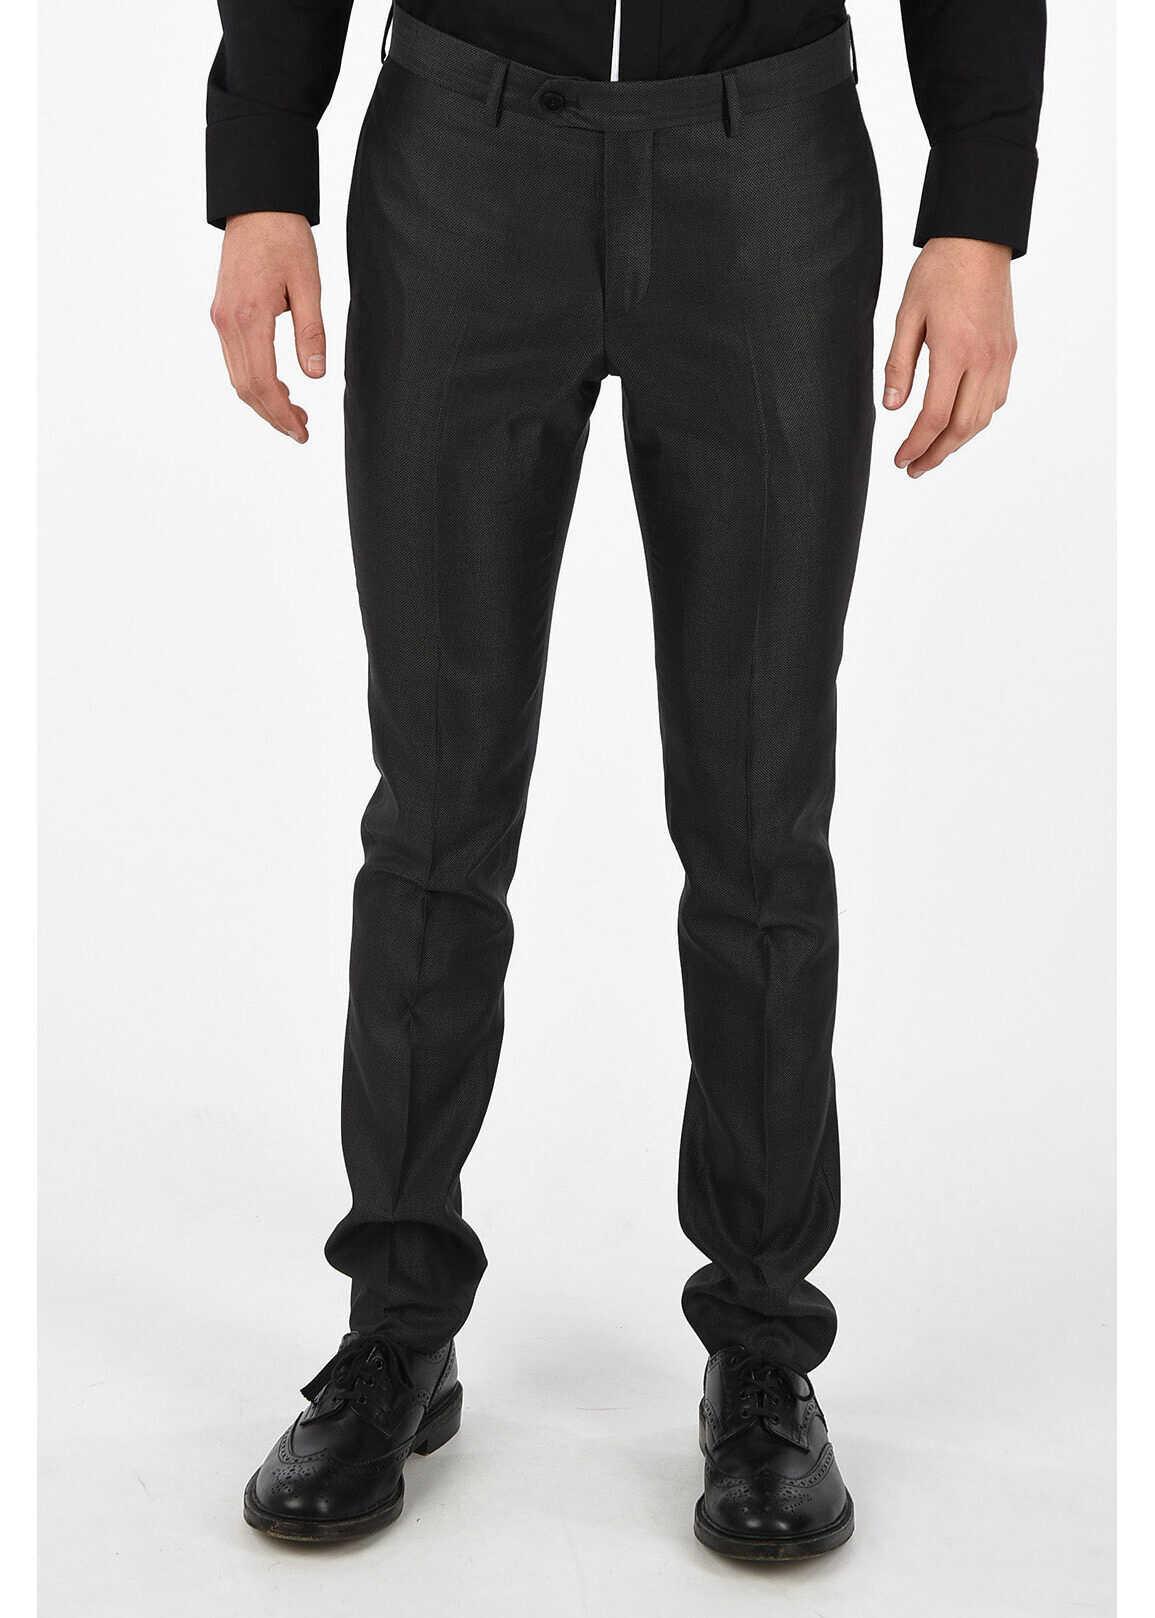 Armani EMPORIO Virgin Wool & Silk Pants BLACK